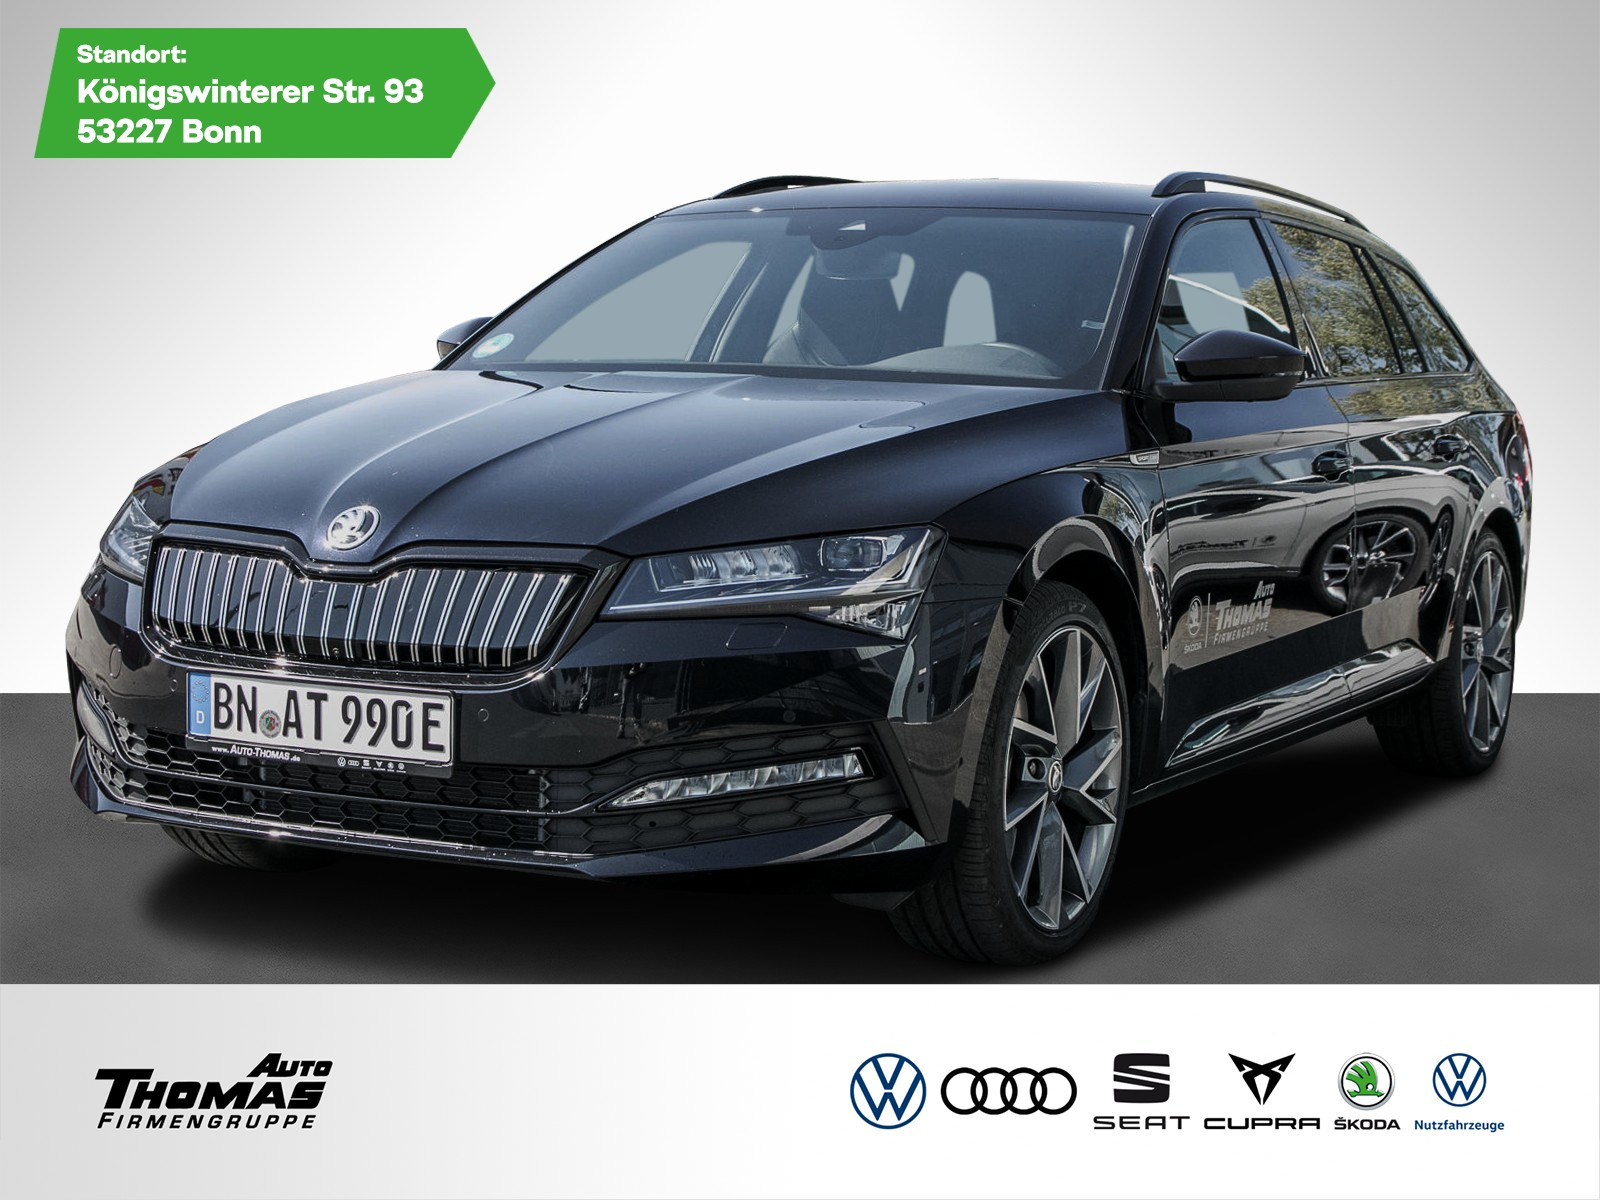 Skoda Superb Combi Sportline 1.4 TSI iV DSG +LED MATRIX+NAVI+AHK+ACC+, Jahr 2020, Hybrid